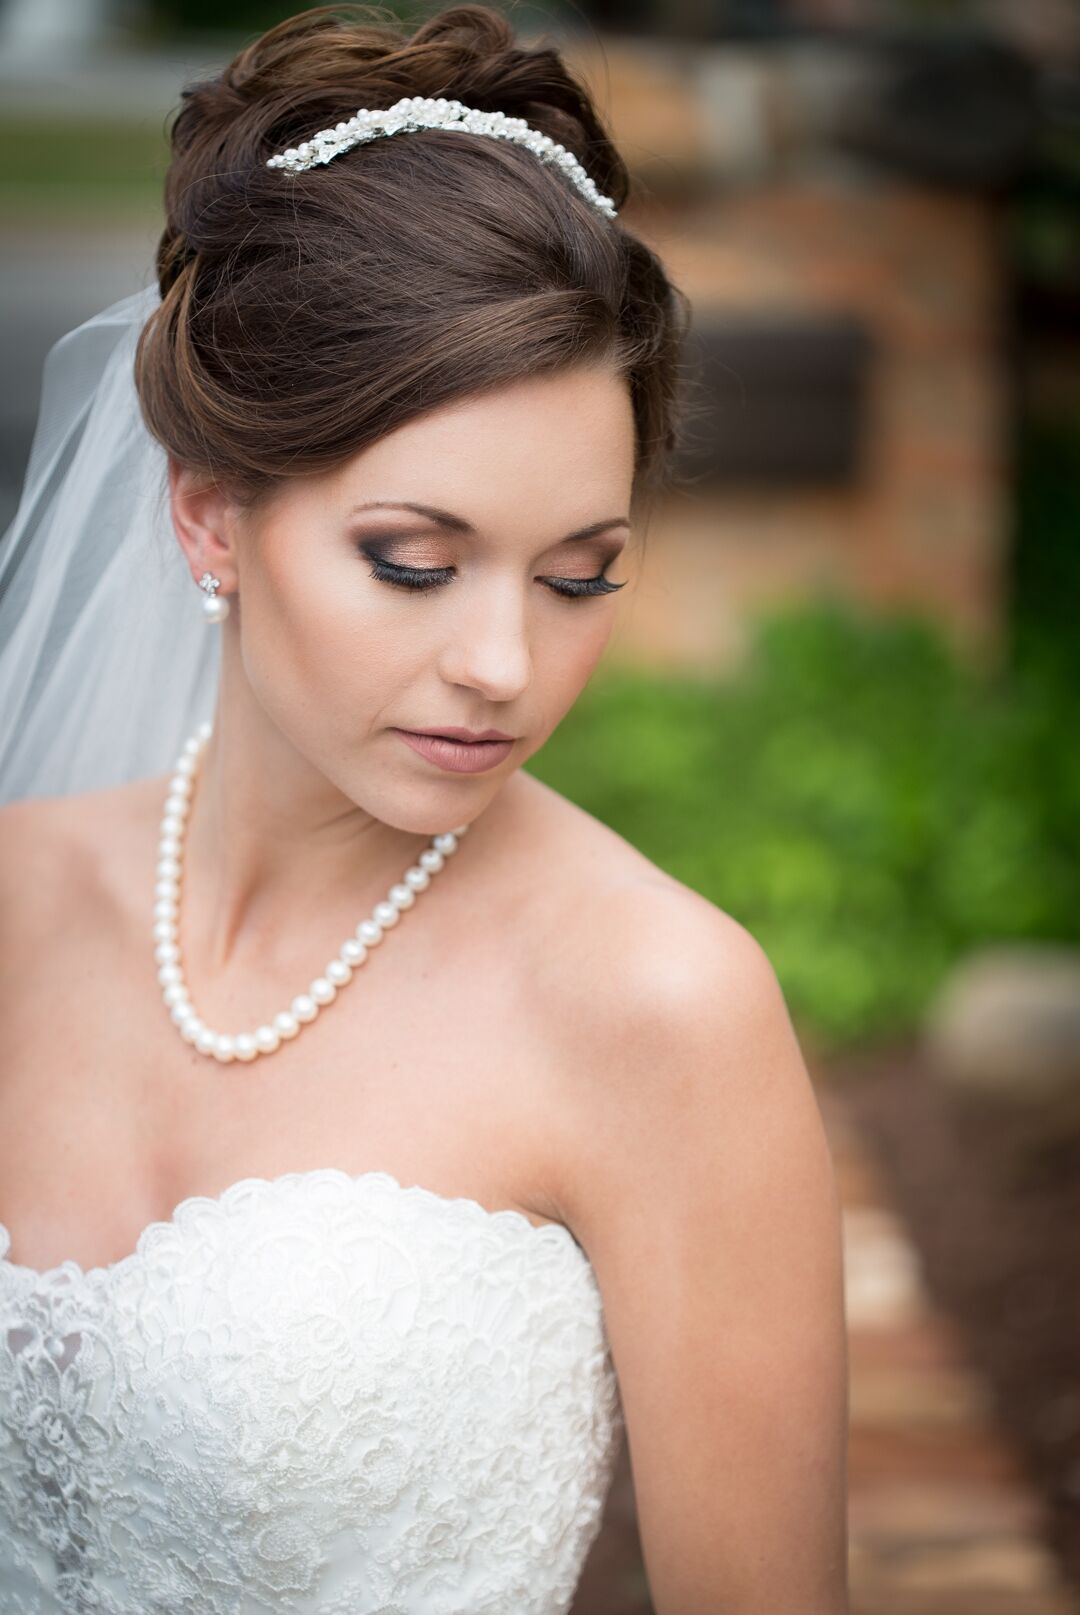 cotton rouge - makeup & hair by katie cotton - greenville, sc